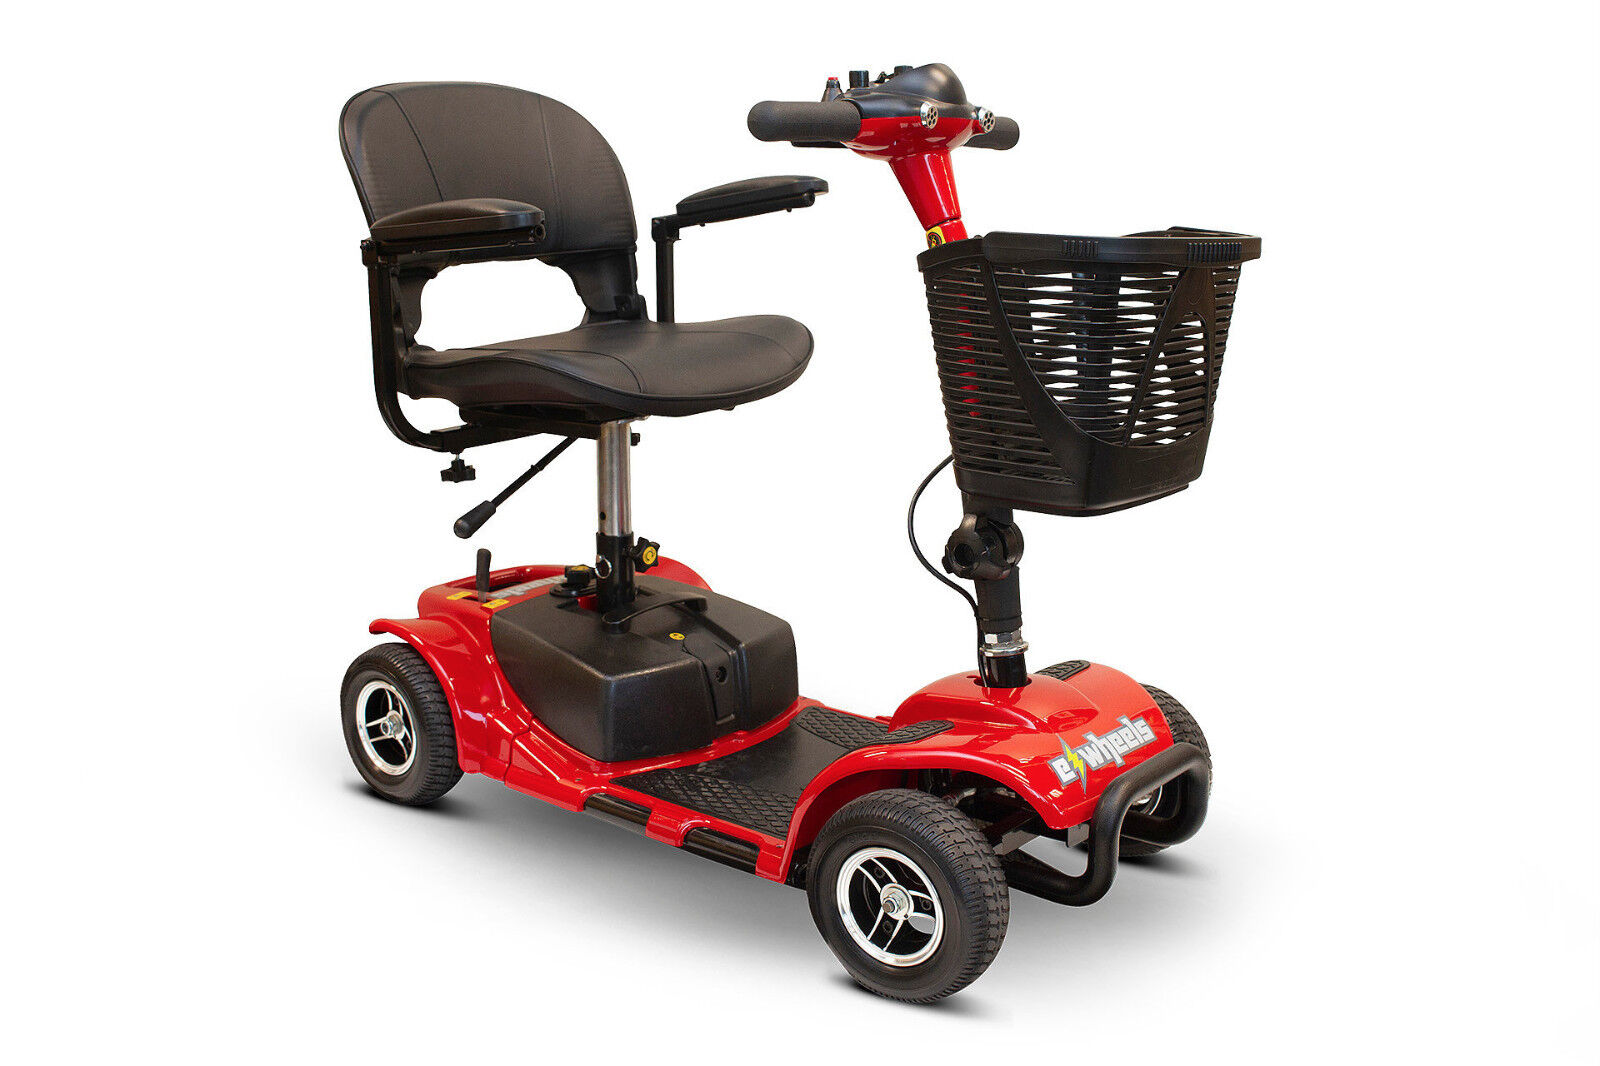 eWheels EW-M34 Long Range Lightweight 4-Wheel Mobility Scoot